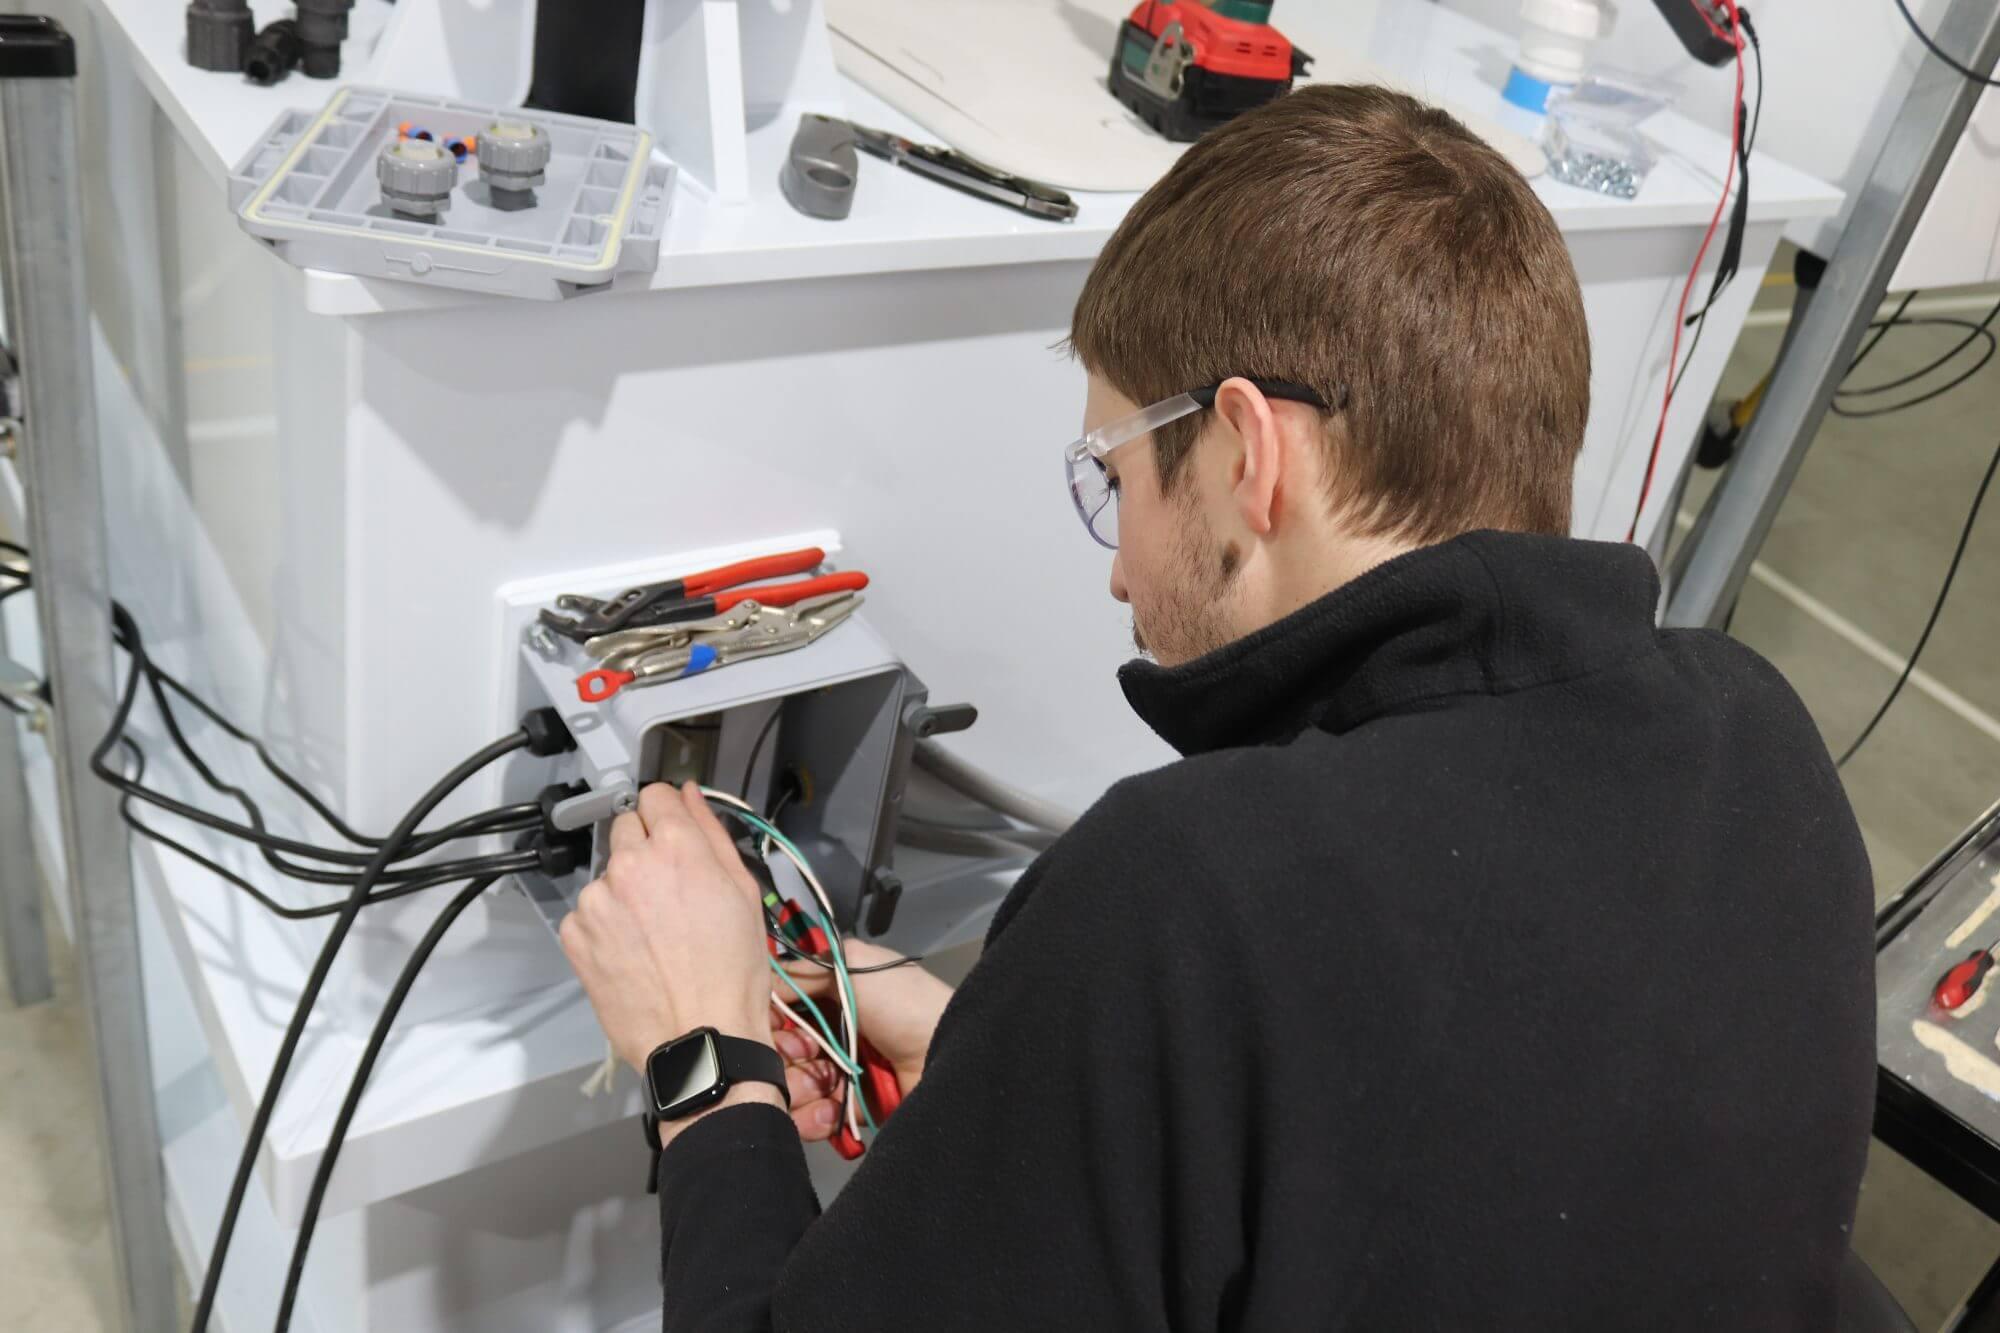 Troubleshooting pH neutralization equipment